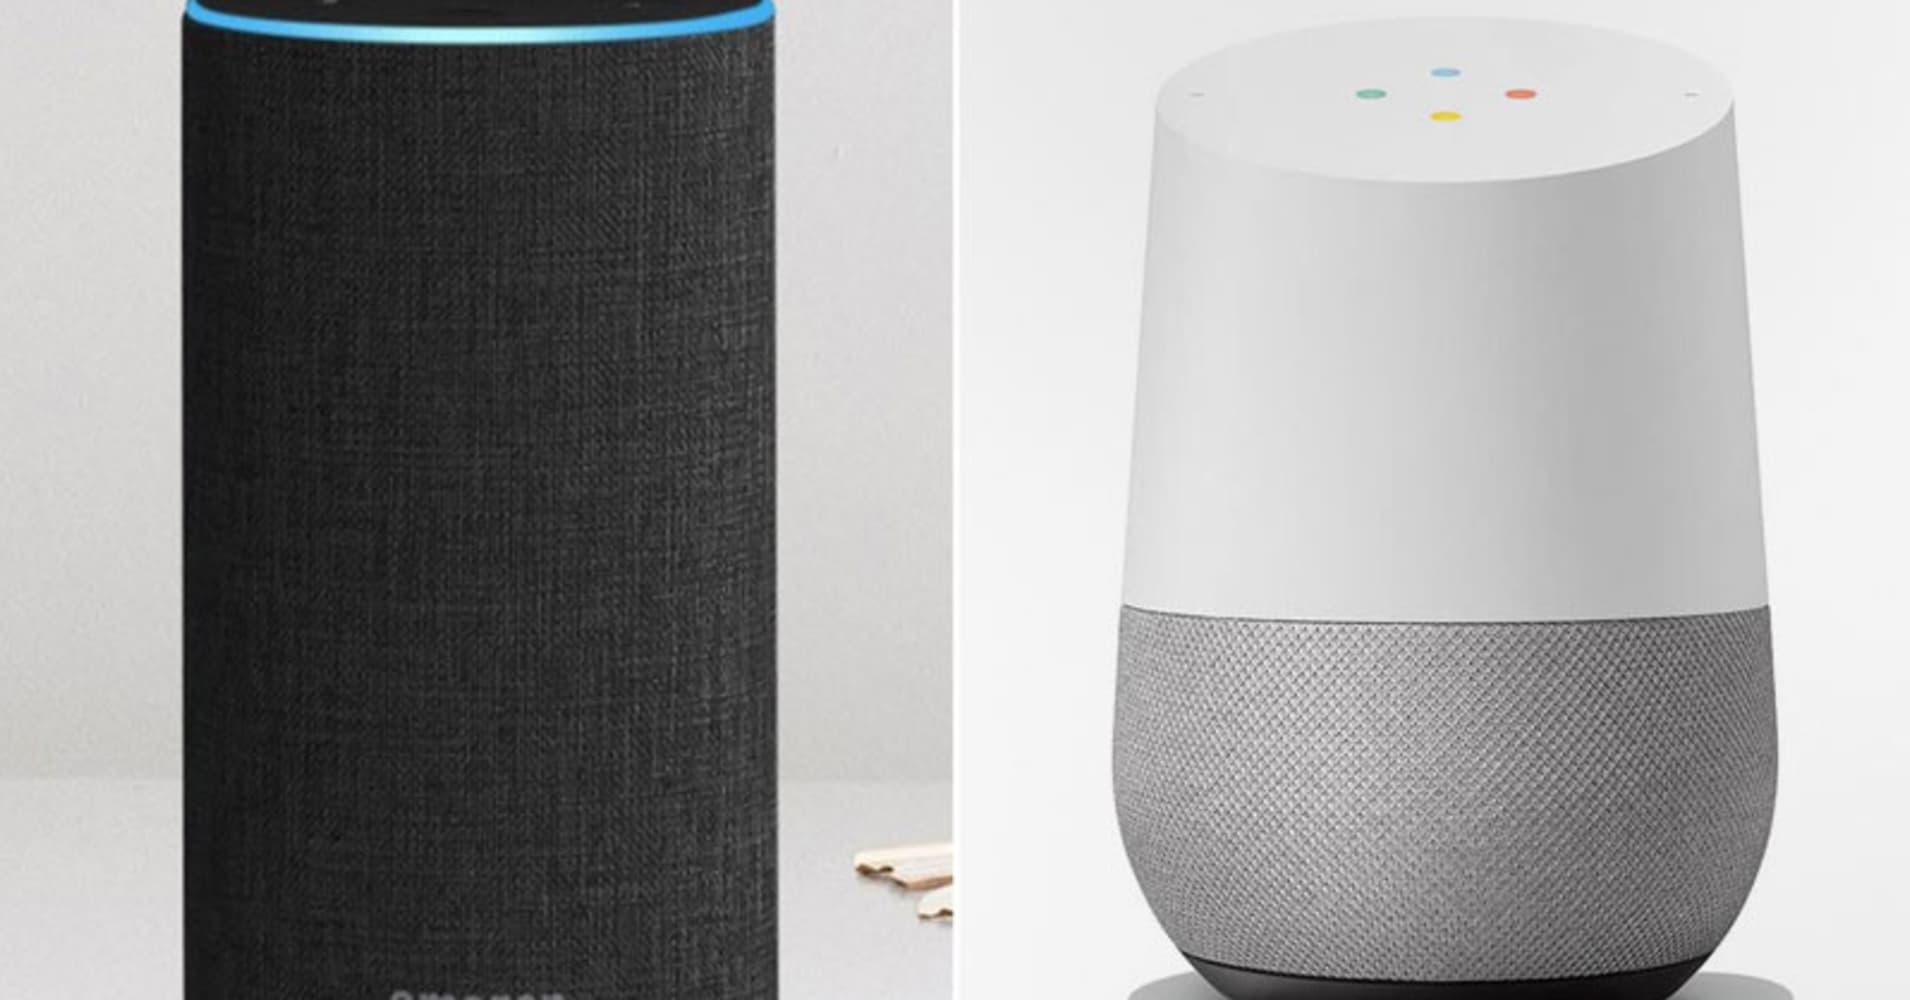 Amazon Alexa Vs. Google Home: Ad Agencies Weigh In